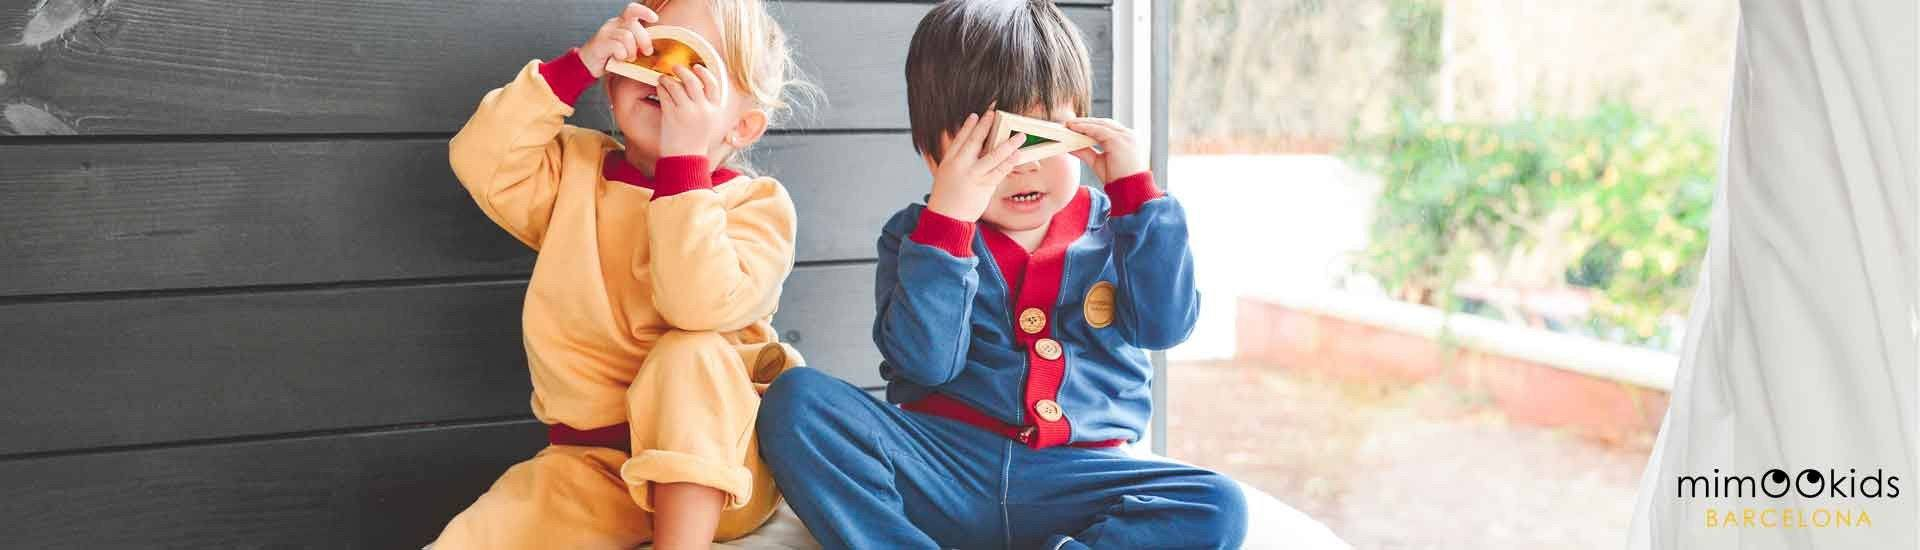 Vêtements enfants coton bio fabrication Europe Mimookids